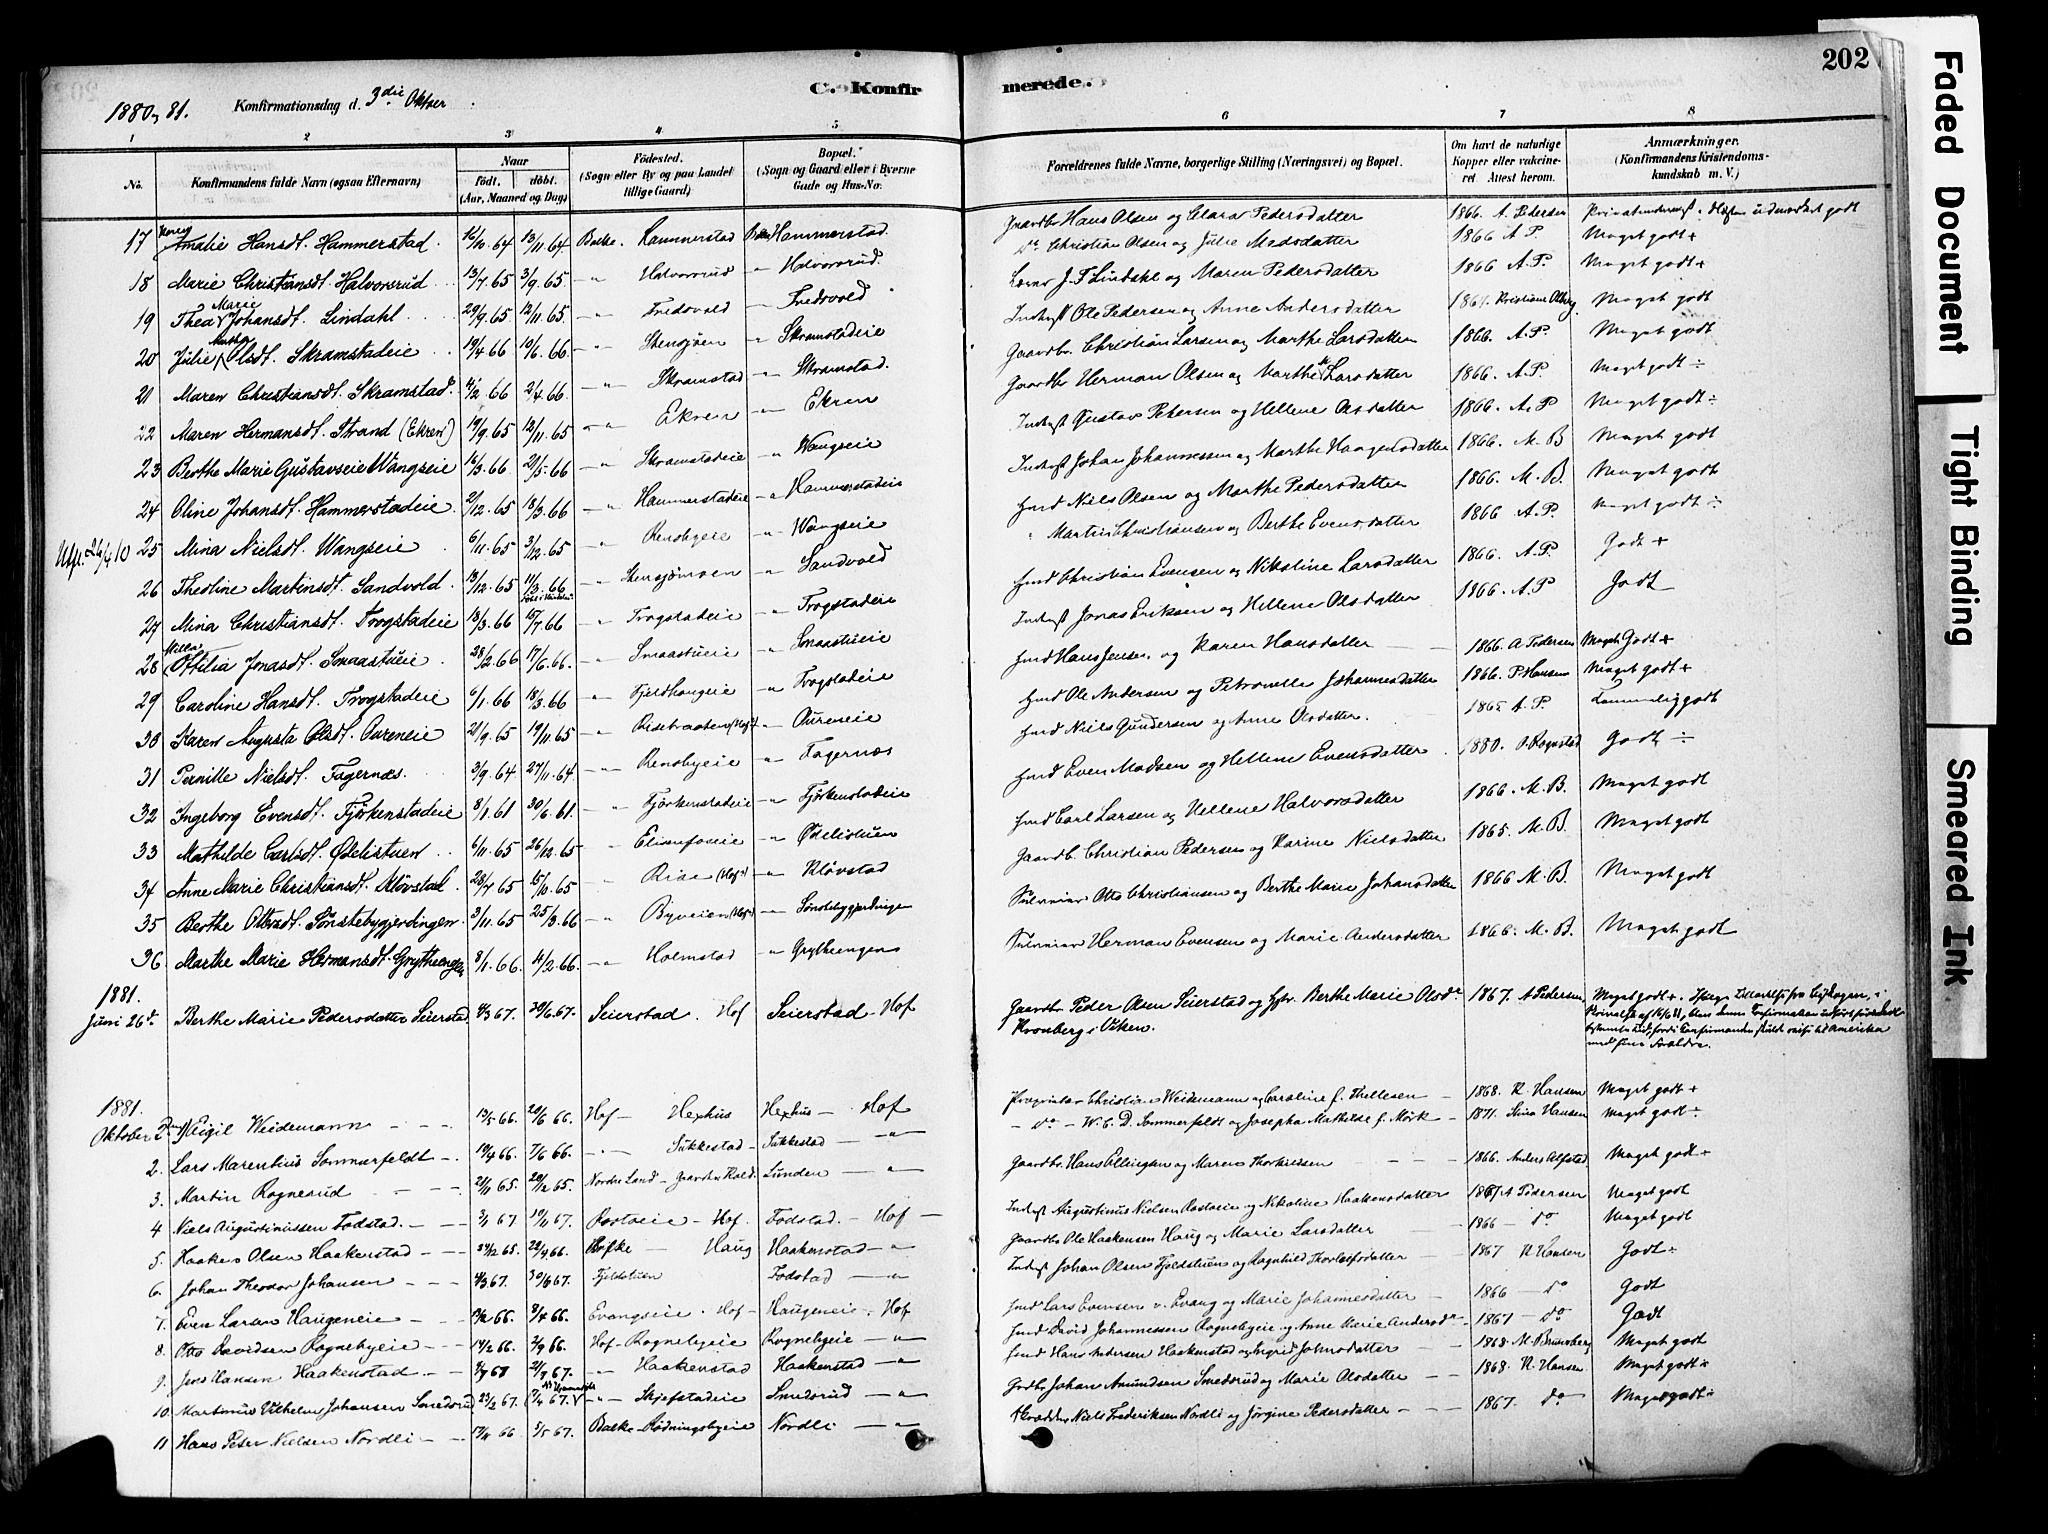 SAH, Østre Toten prestekontor, Ministerialbok nr. 6 /1, 1878-1896, s. 202